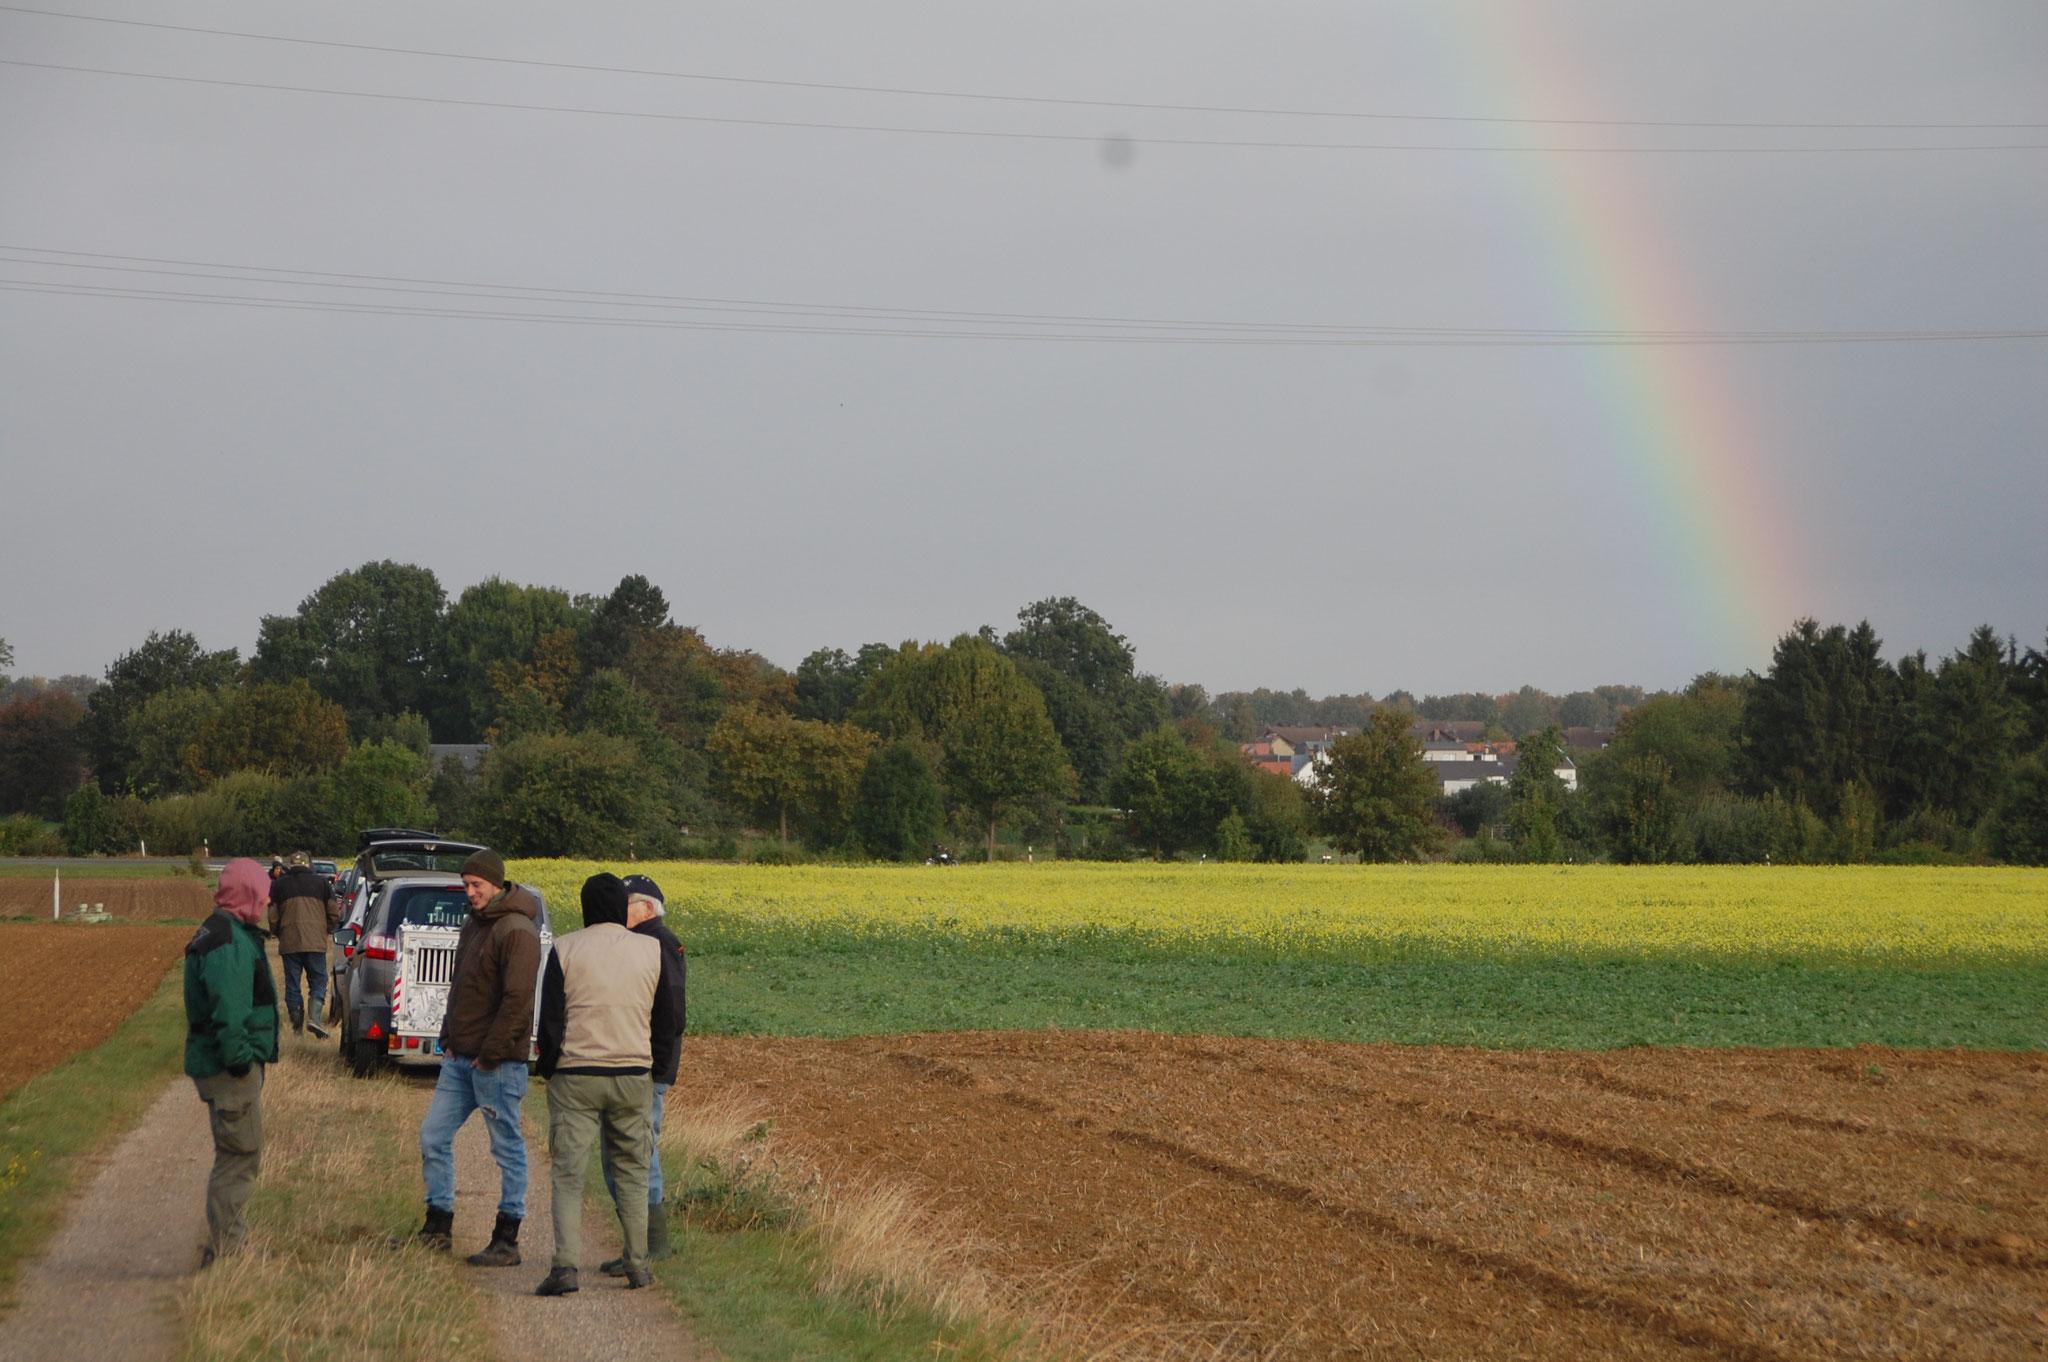 Die Hundeführer bewundern den Regenbogen